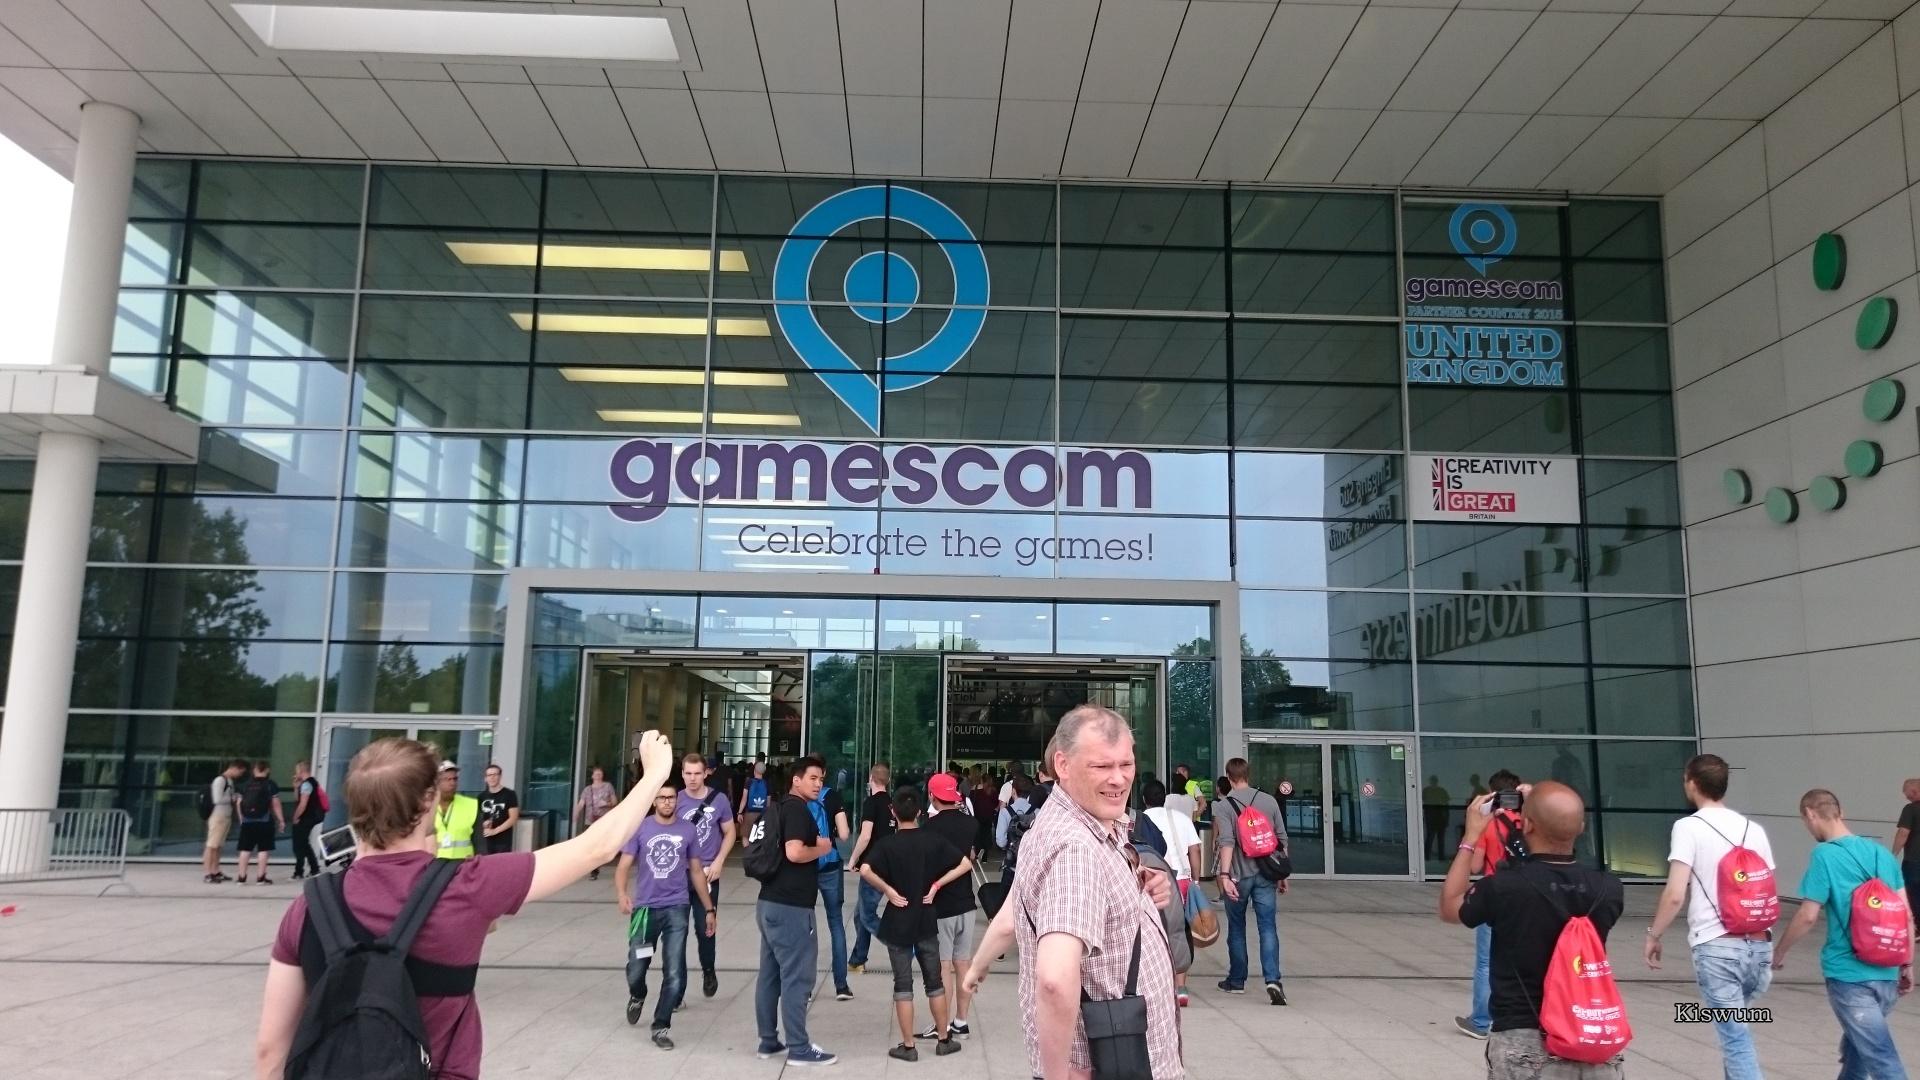 http://www.kiswum.com/wp-content/uploads/Gamescom_2015/DSC_2434.jpg